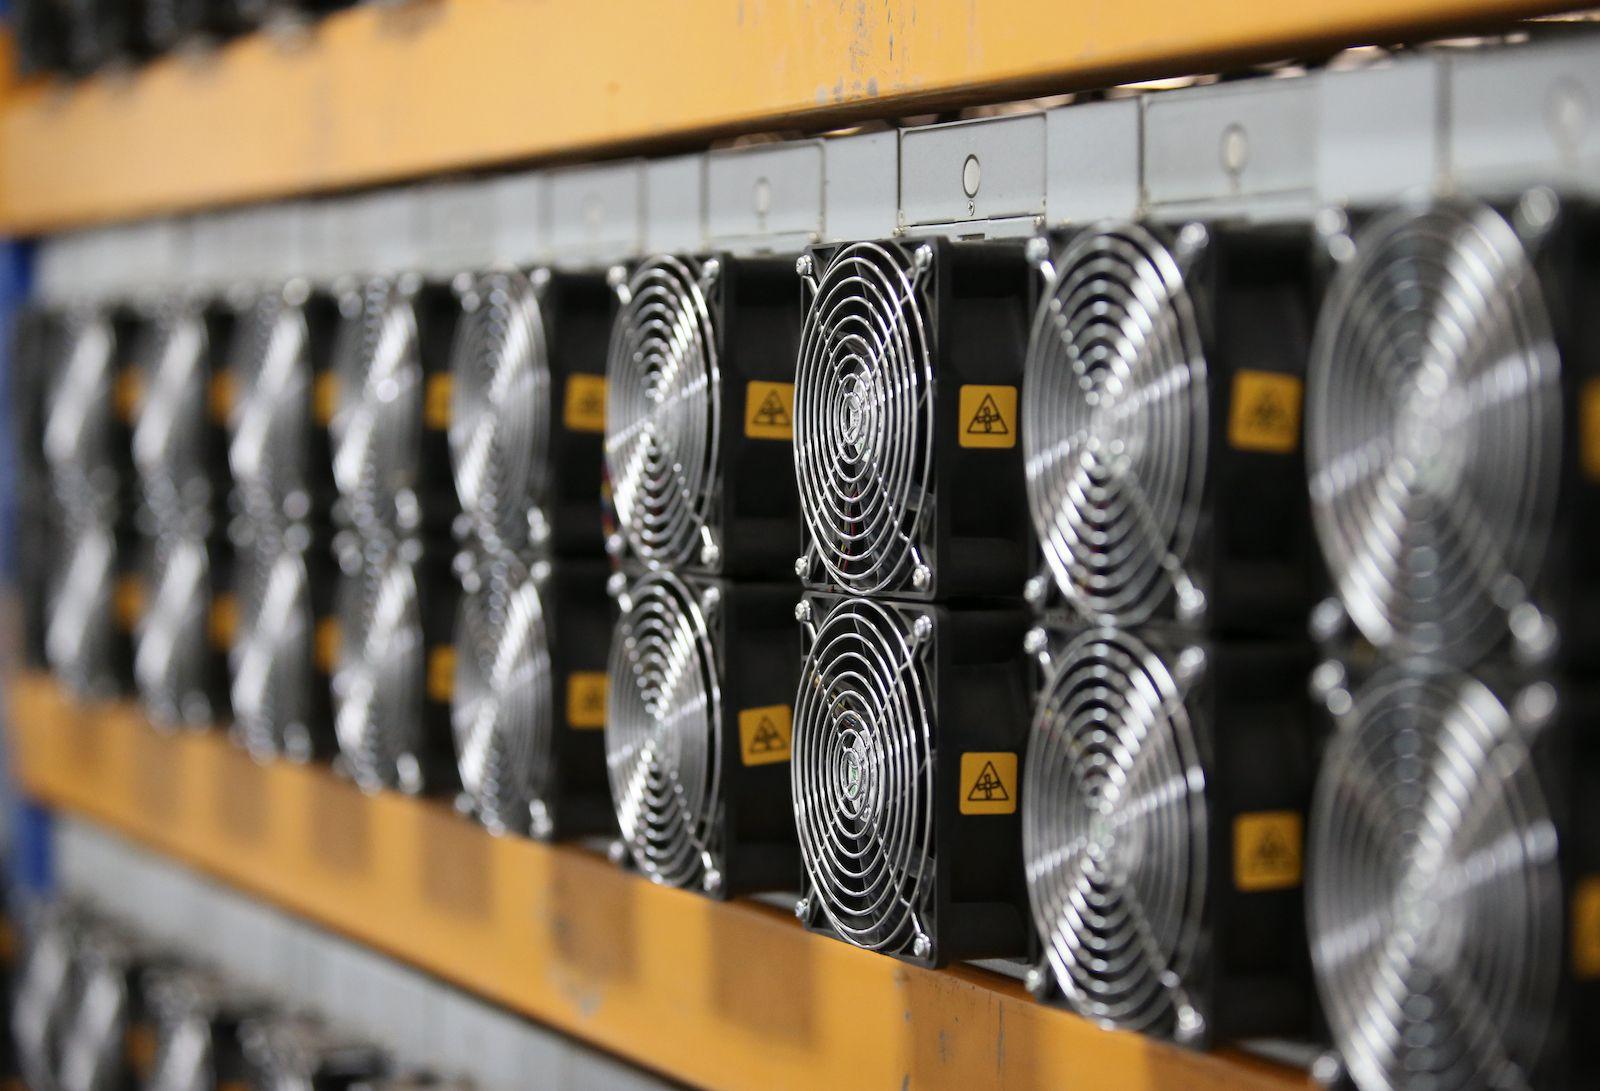 Argo Blockchain's Texas Mining Facility Will Propel Shares Higher, Analysts Say